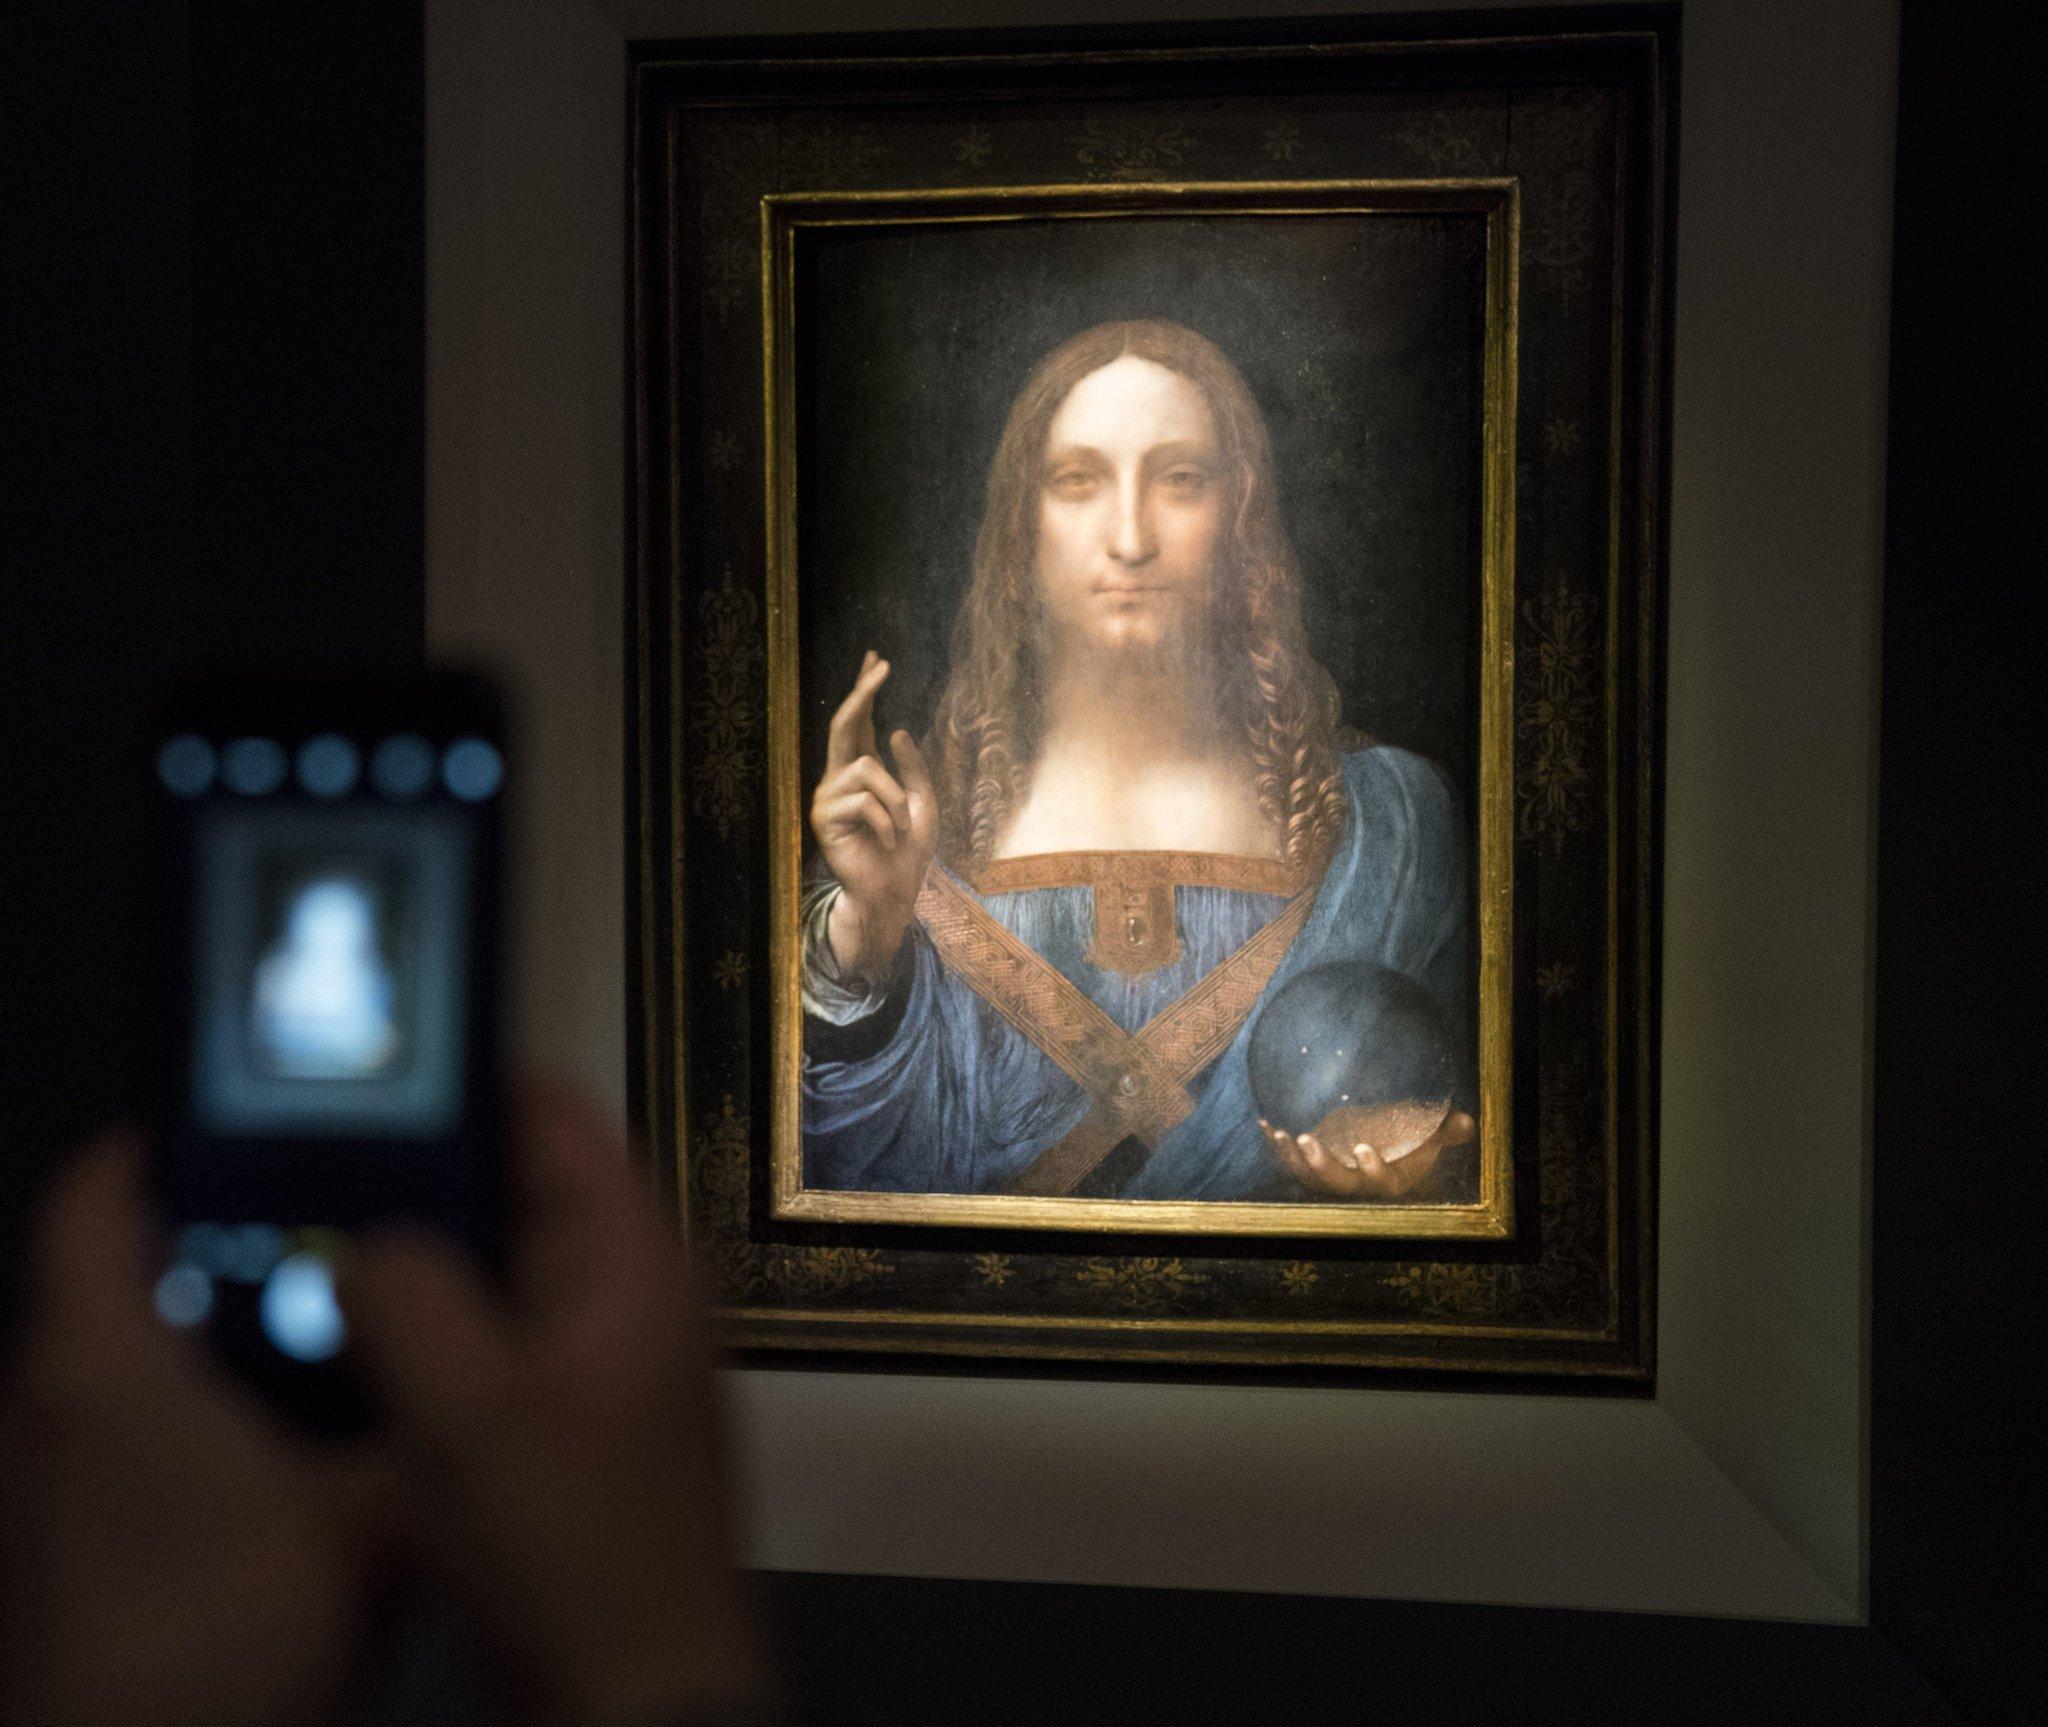 The painting Salvator Mundi by Leonardo da Vinci